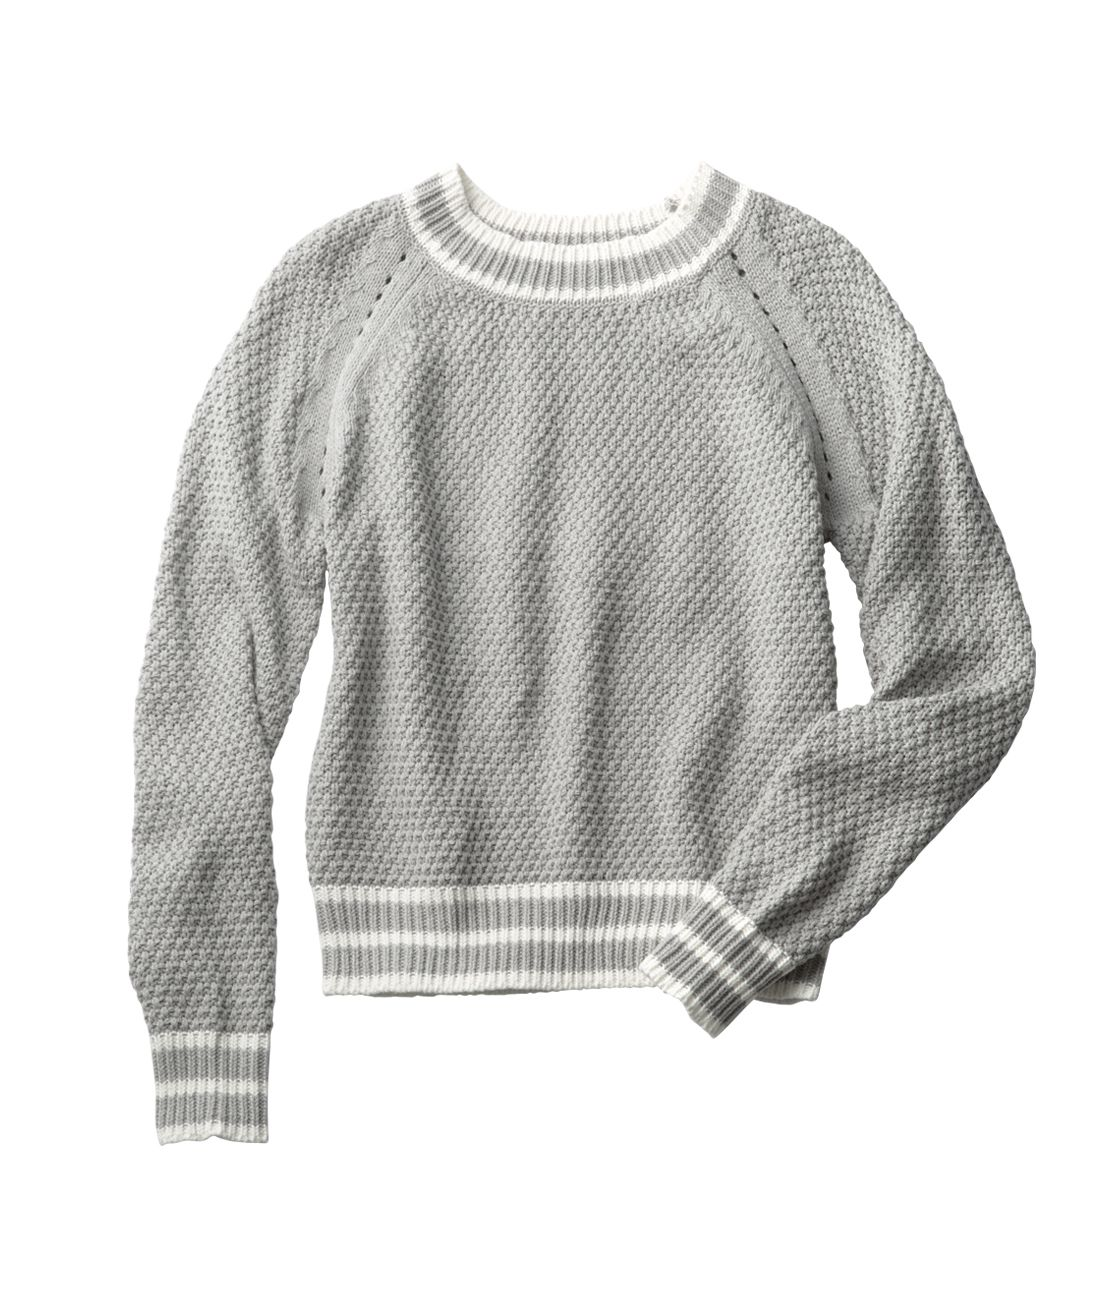 Eyelet line sweater